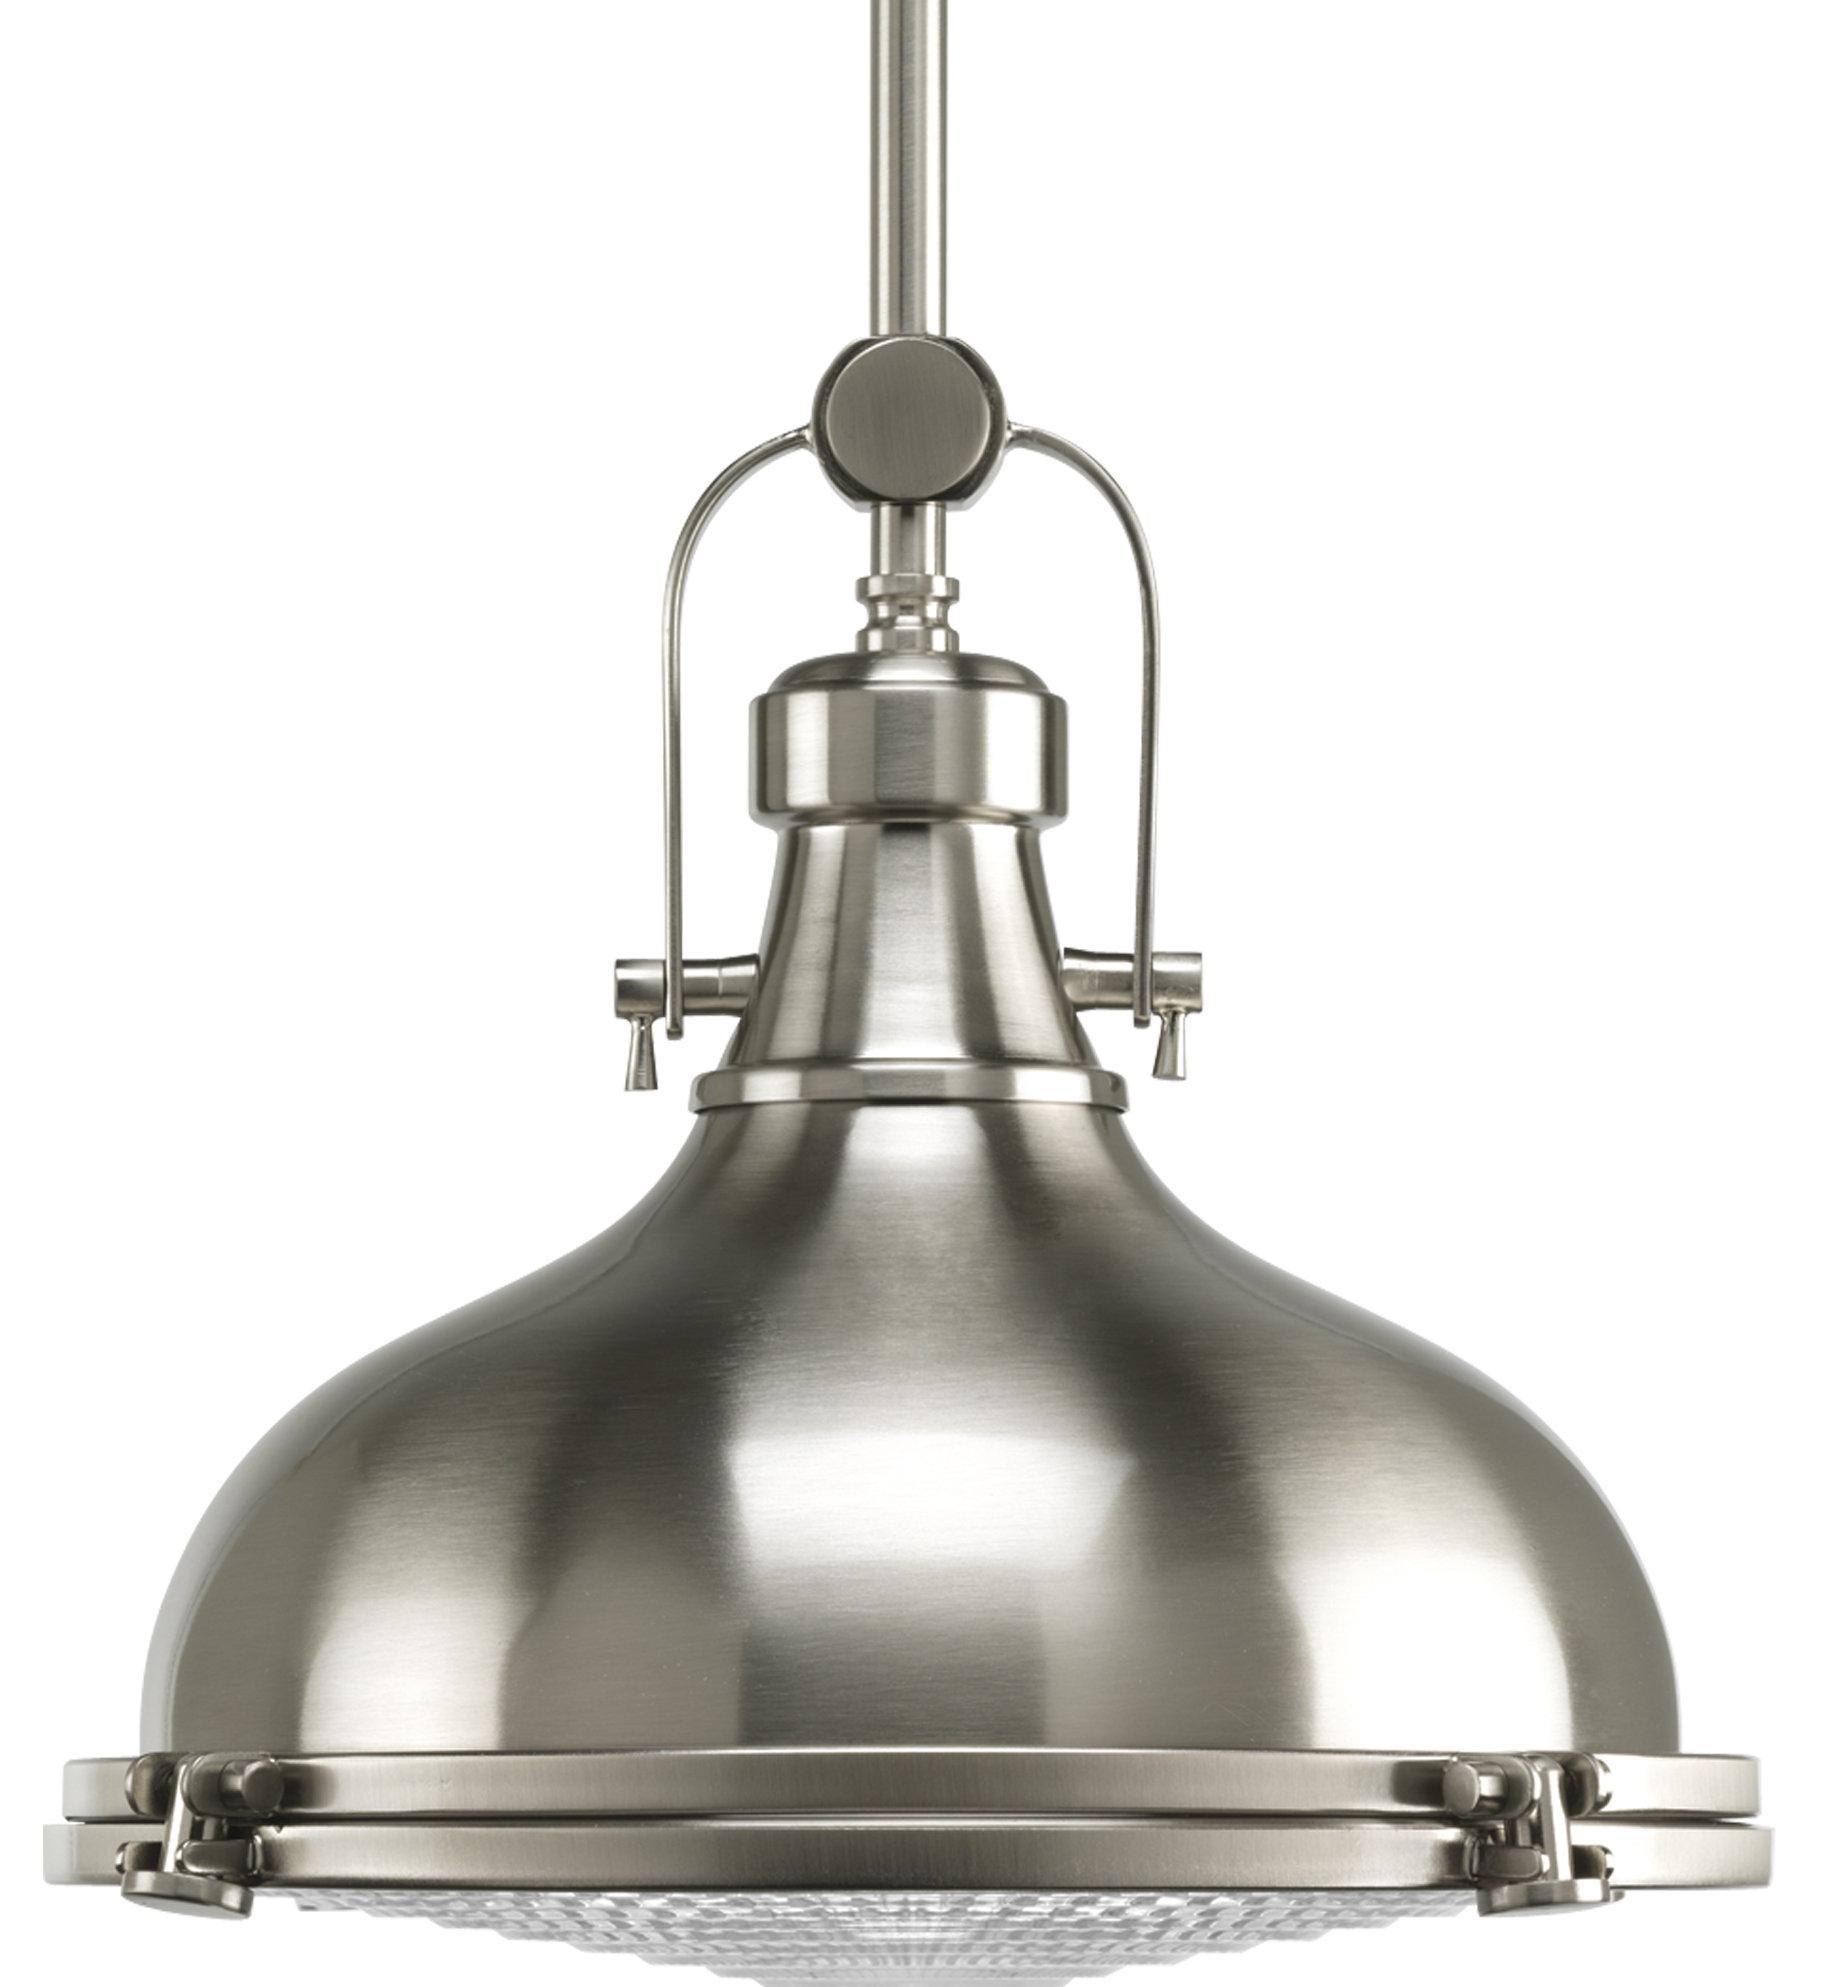 Freeda 1-Light Single Dome Pendant intended for Macon 1-Light Single Dome Pendants (Image 15 of 30)